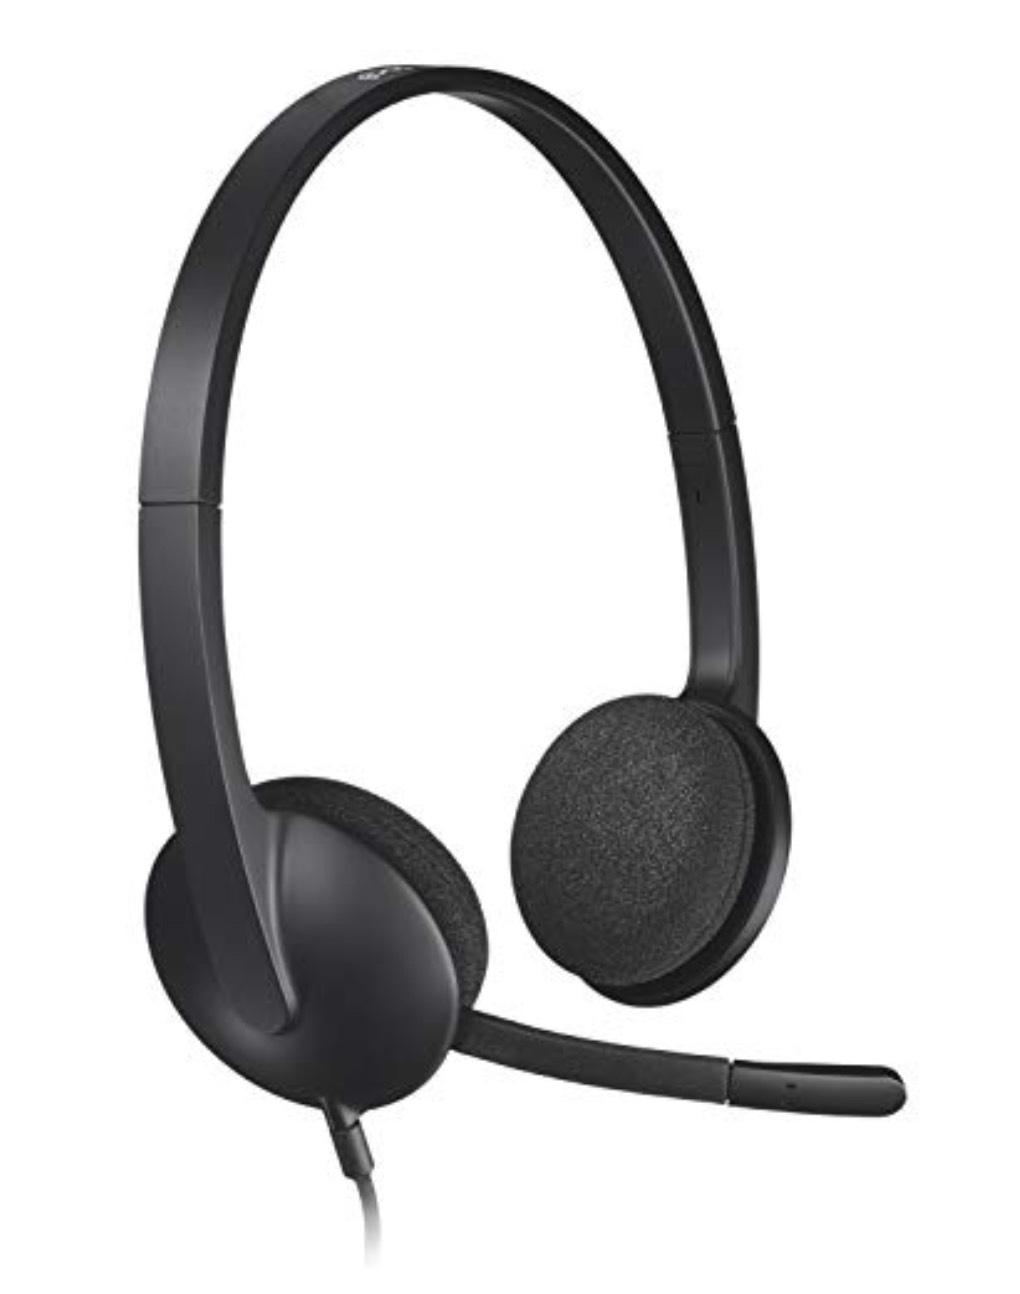 Logitech USB Headset H340 (Prime Exklusiv)